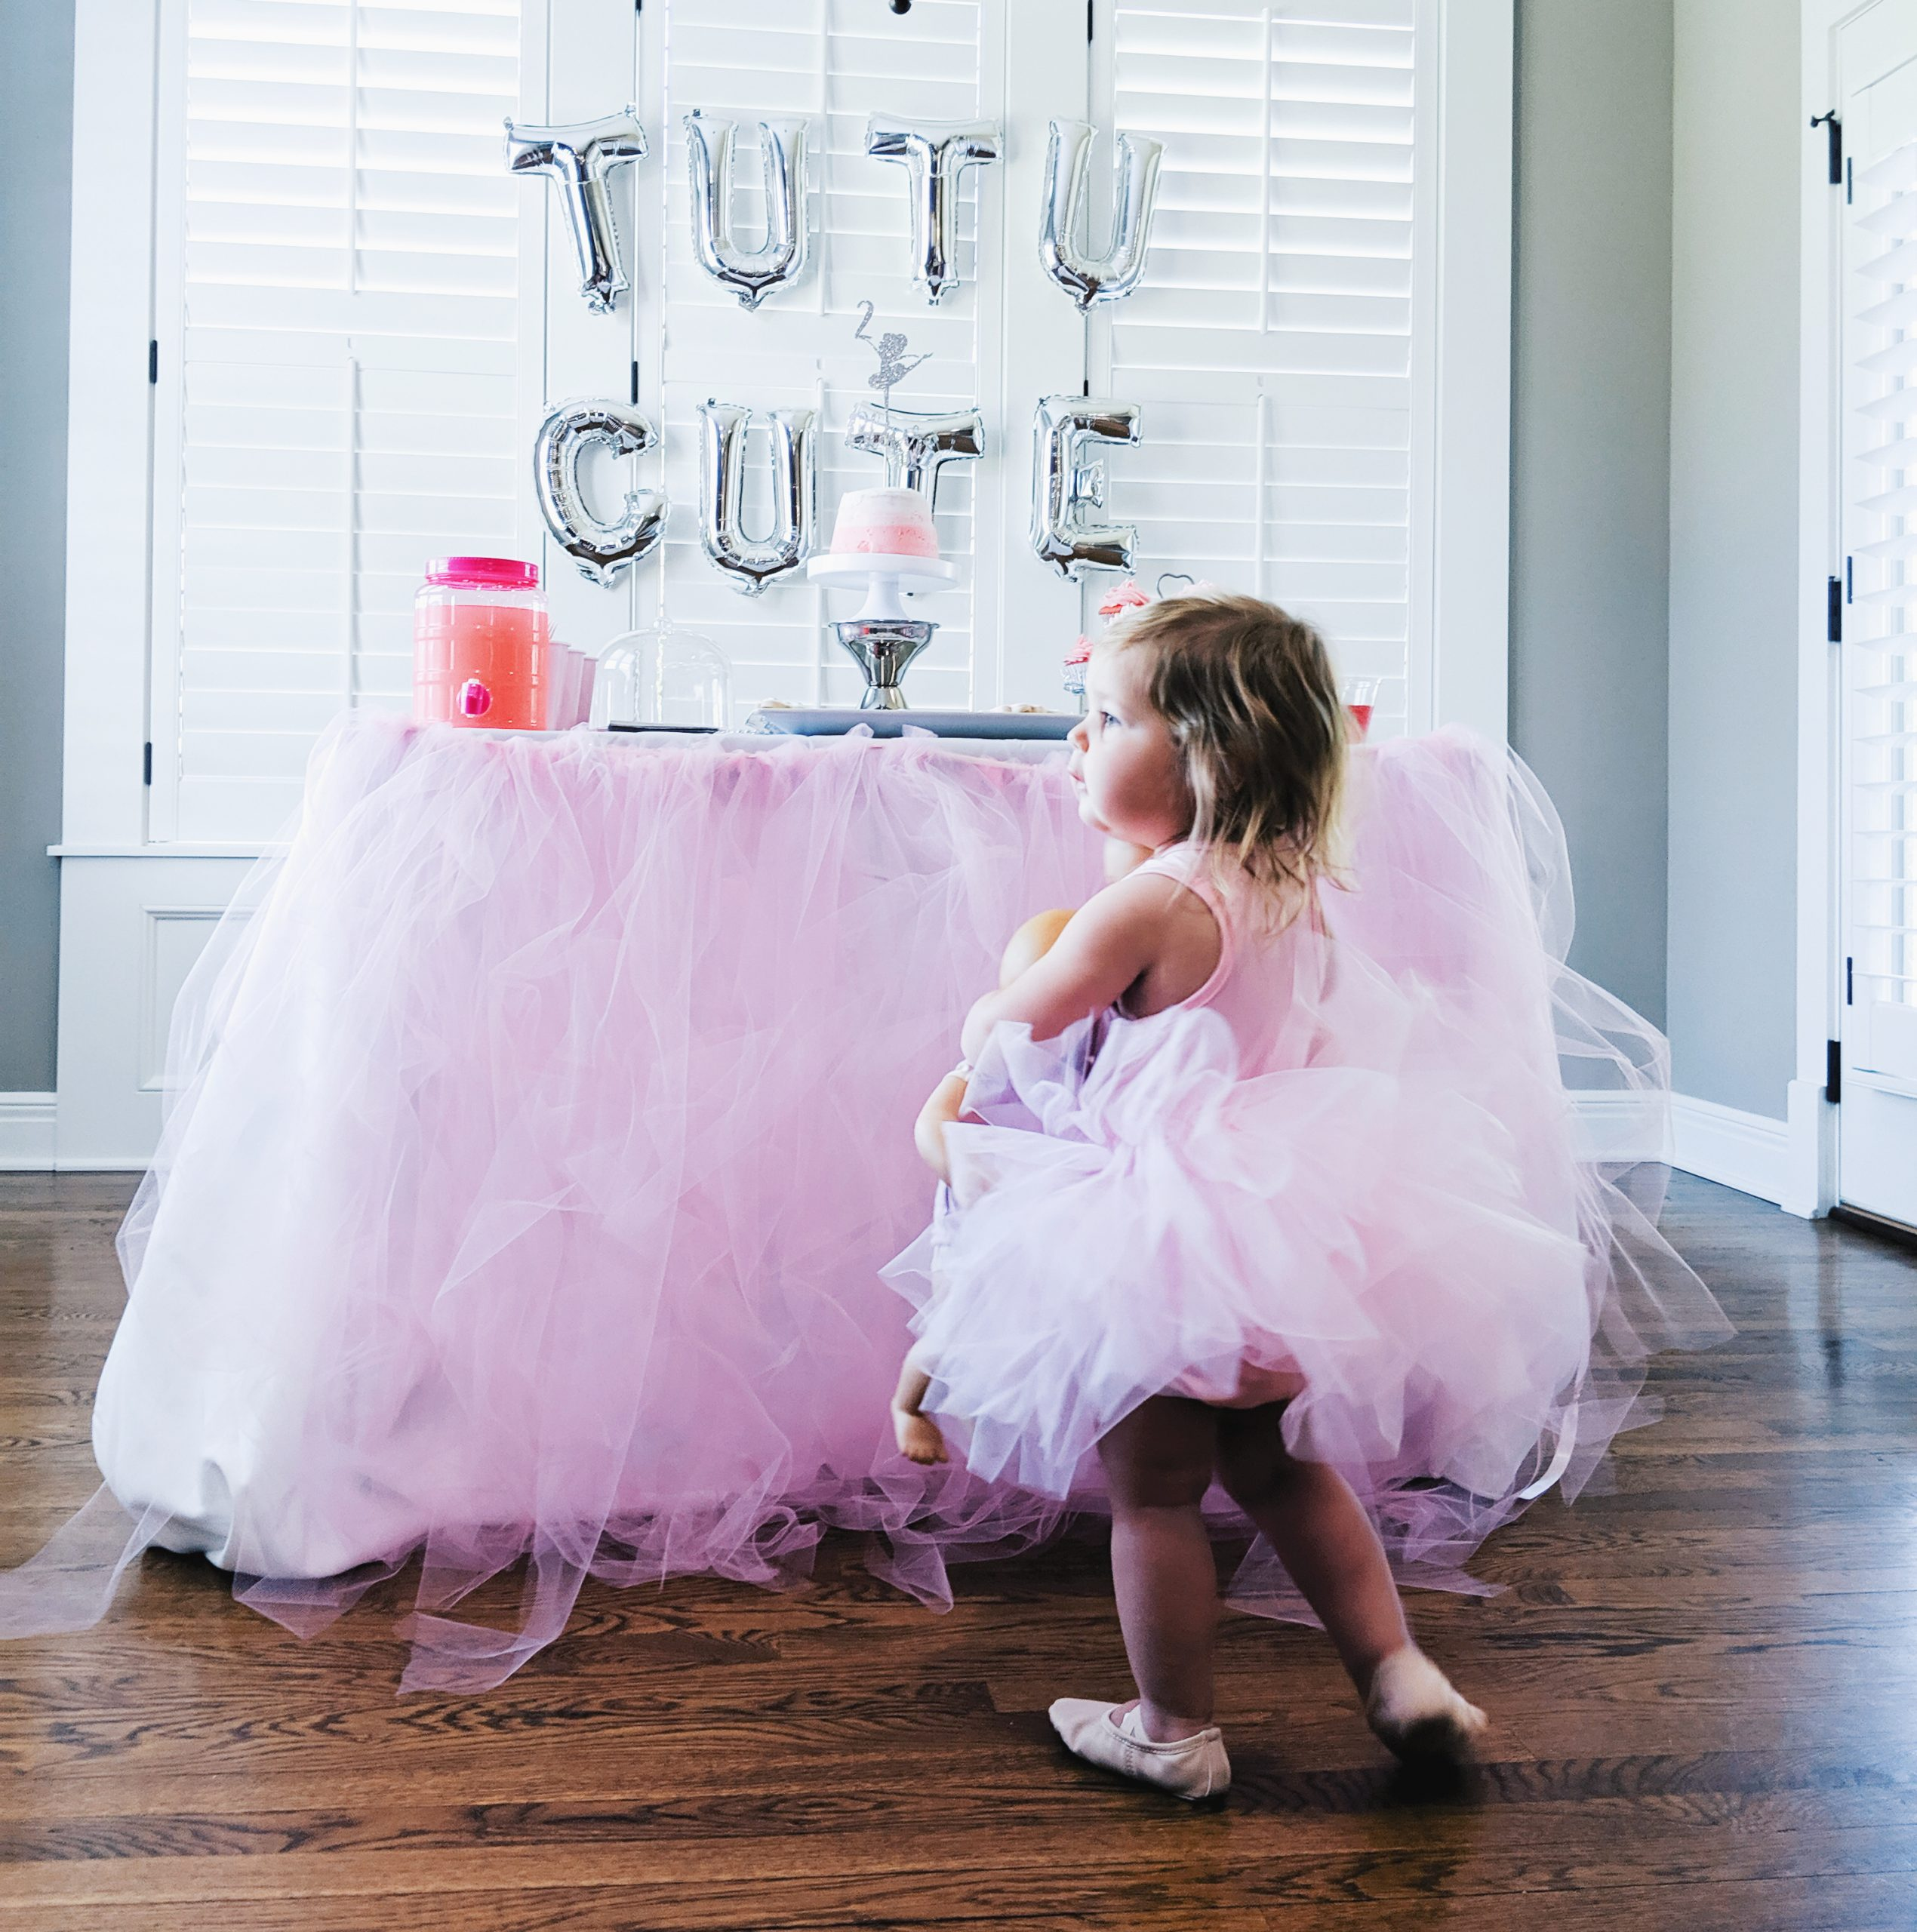 iloveplum Tutu Dupes - Looking for plumnyc tutu dupes? This Amazon tutu is great quality and a fraction of the price! A great plum tutu dupe! Plum tutu dupes, tutu cute, baby girl tutu #designerdupes #designerdupe #tutucute